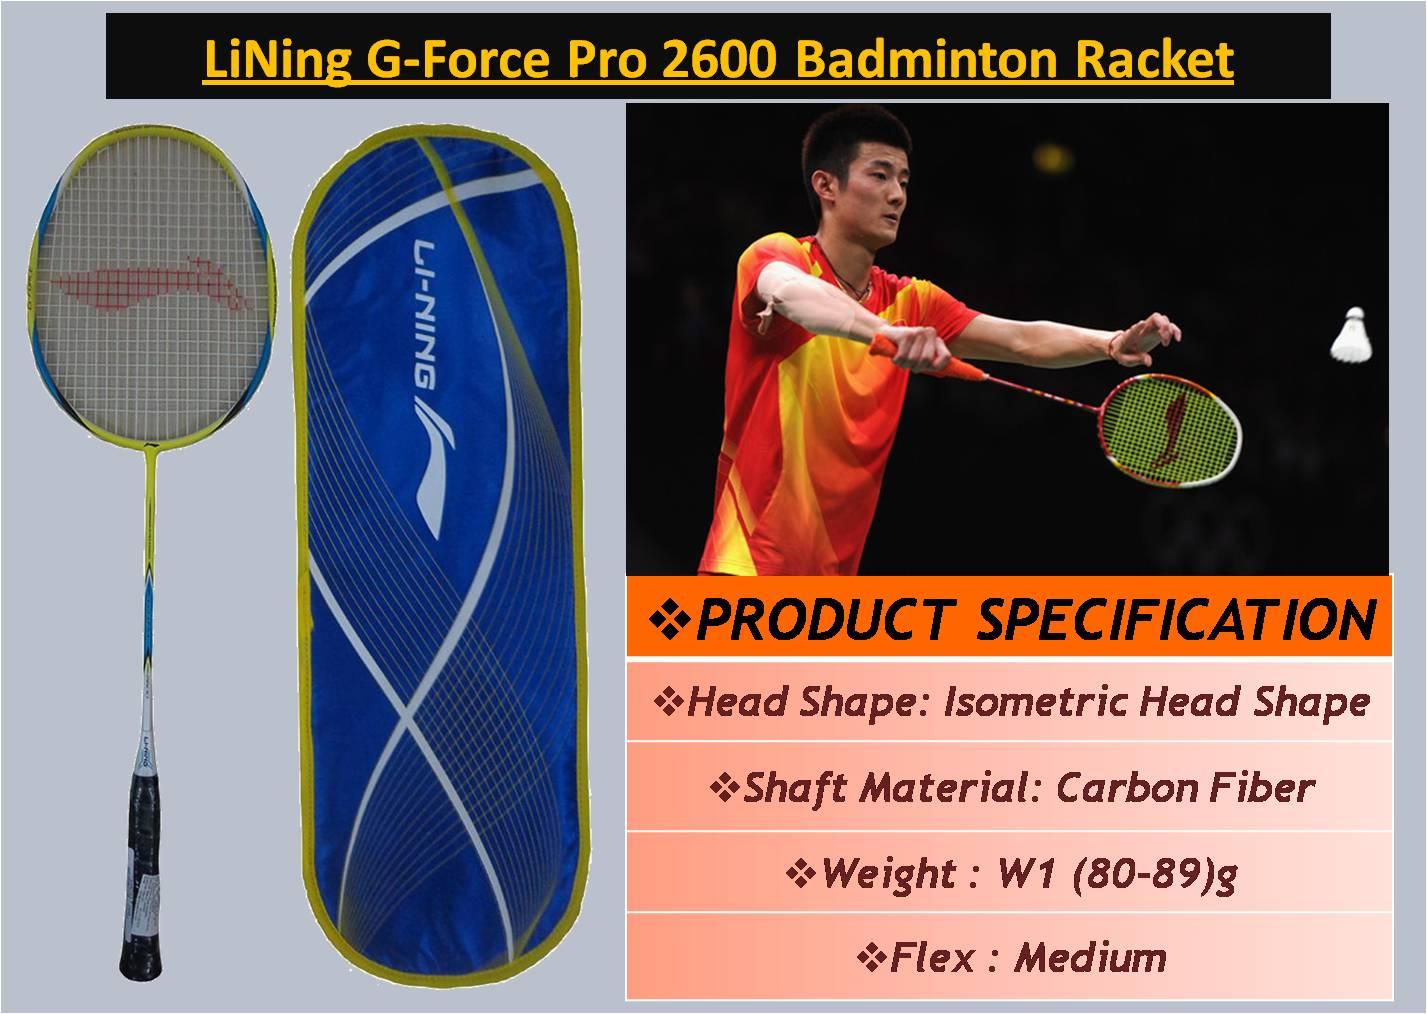 LiNing G-Force Pro 2600 Badminton Racket